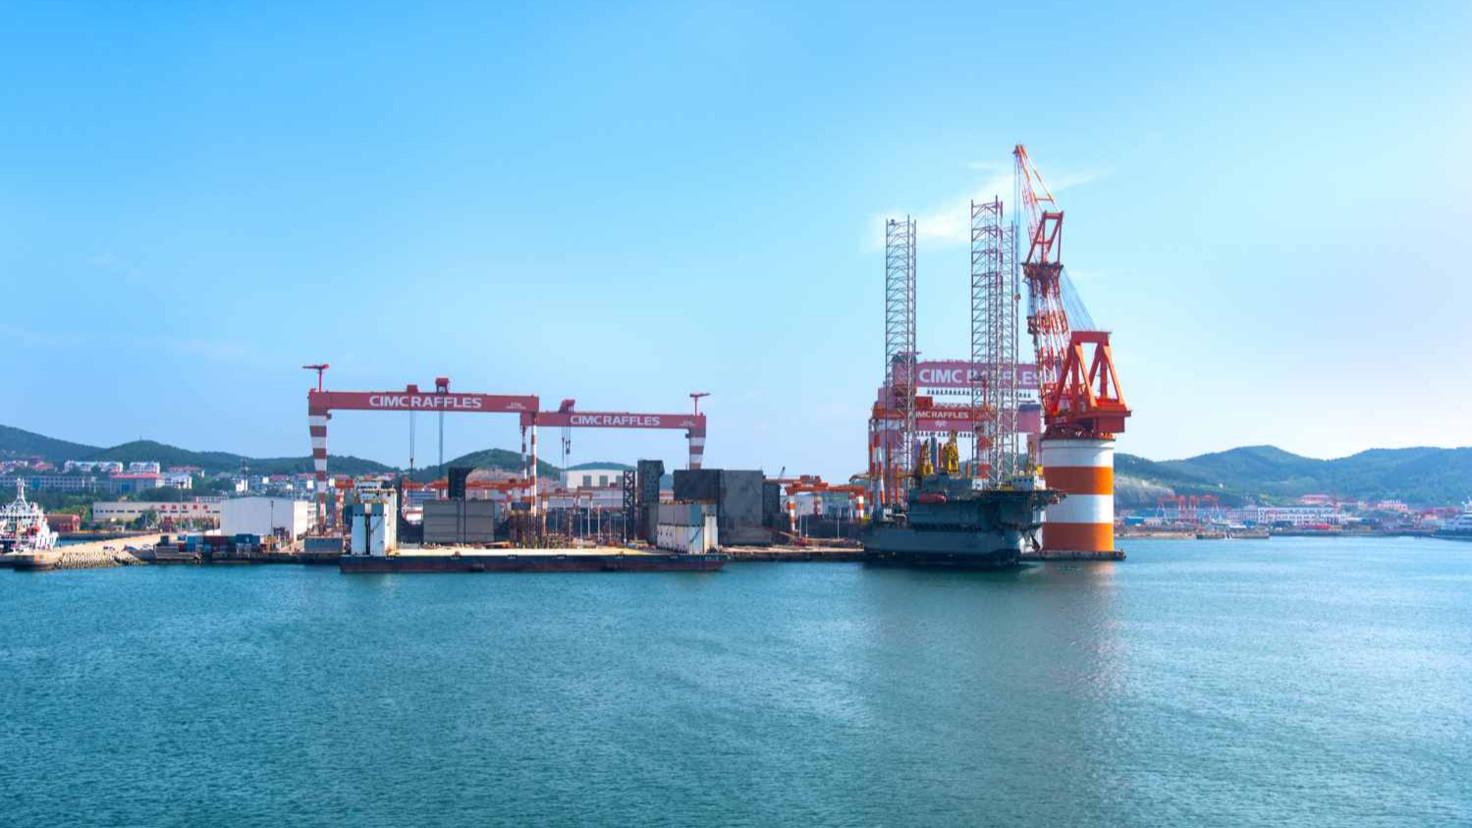 Chinas Yantai Port Group to launch liquefied natural gas storage facilities